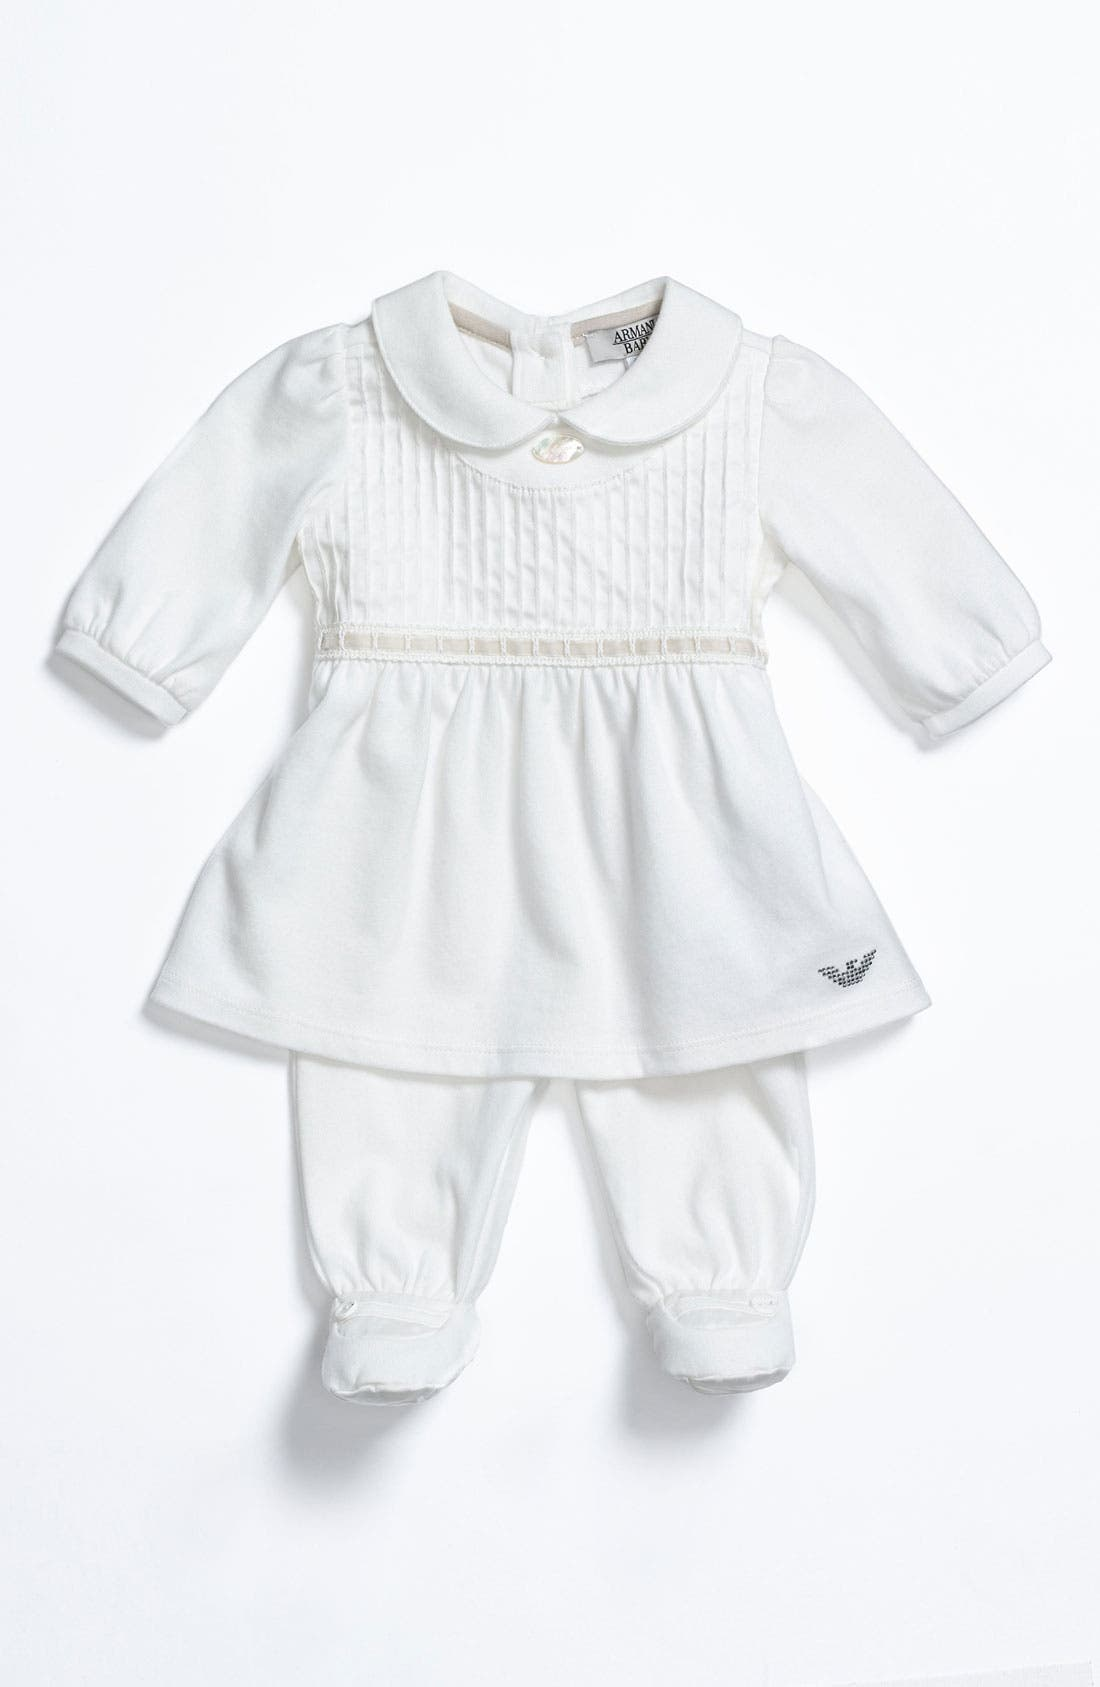 Alternate Image 1 Selected - Armani Junior Dress & Footed Leggings (Infant)